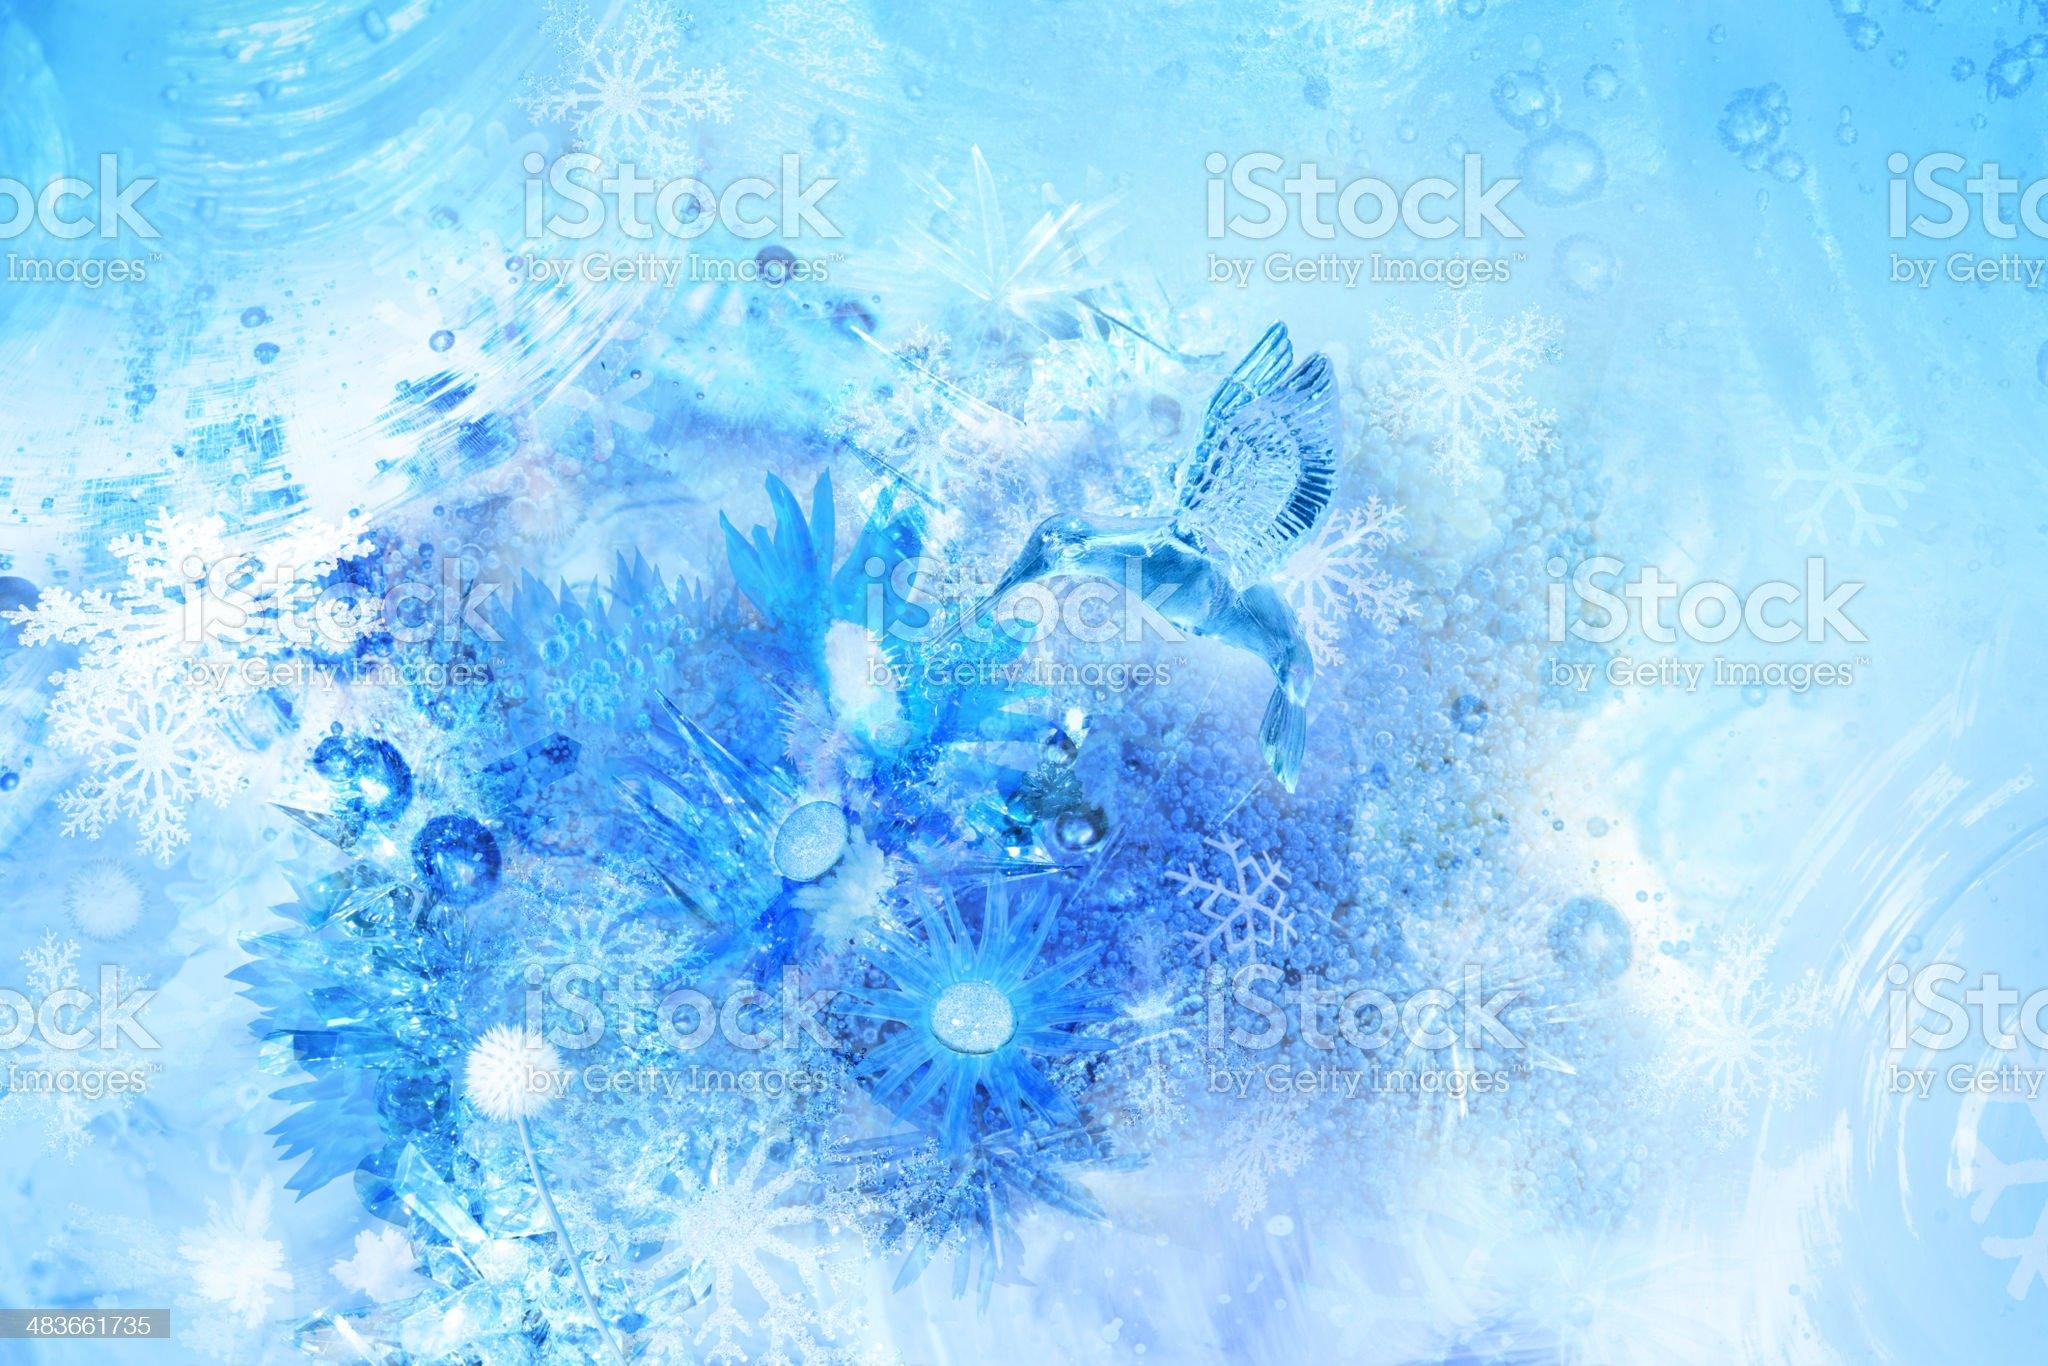 Ice bird scene royalty-free stock photo